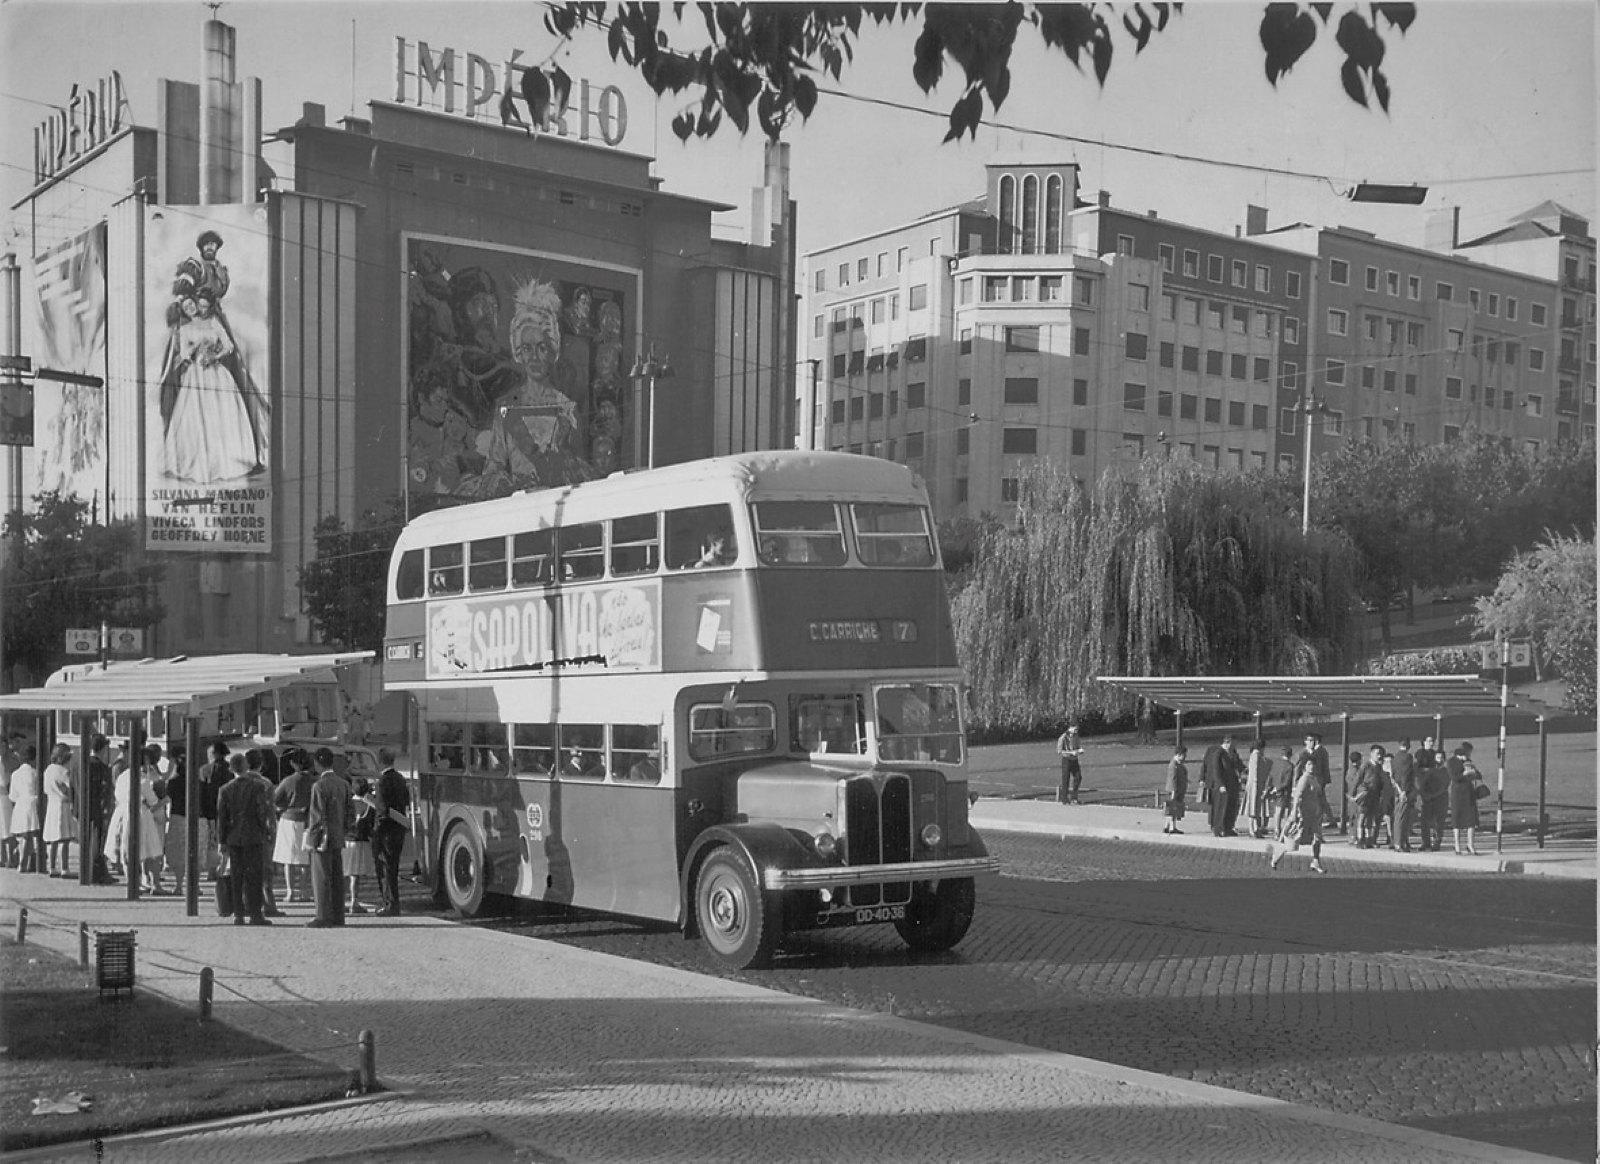 Autocarrro 7, Alameda (História da CCFL, vol 3)